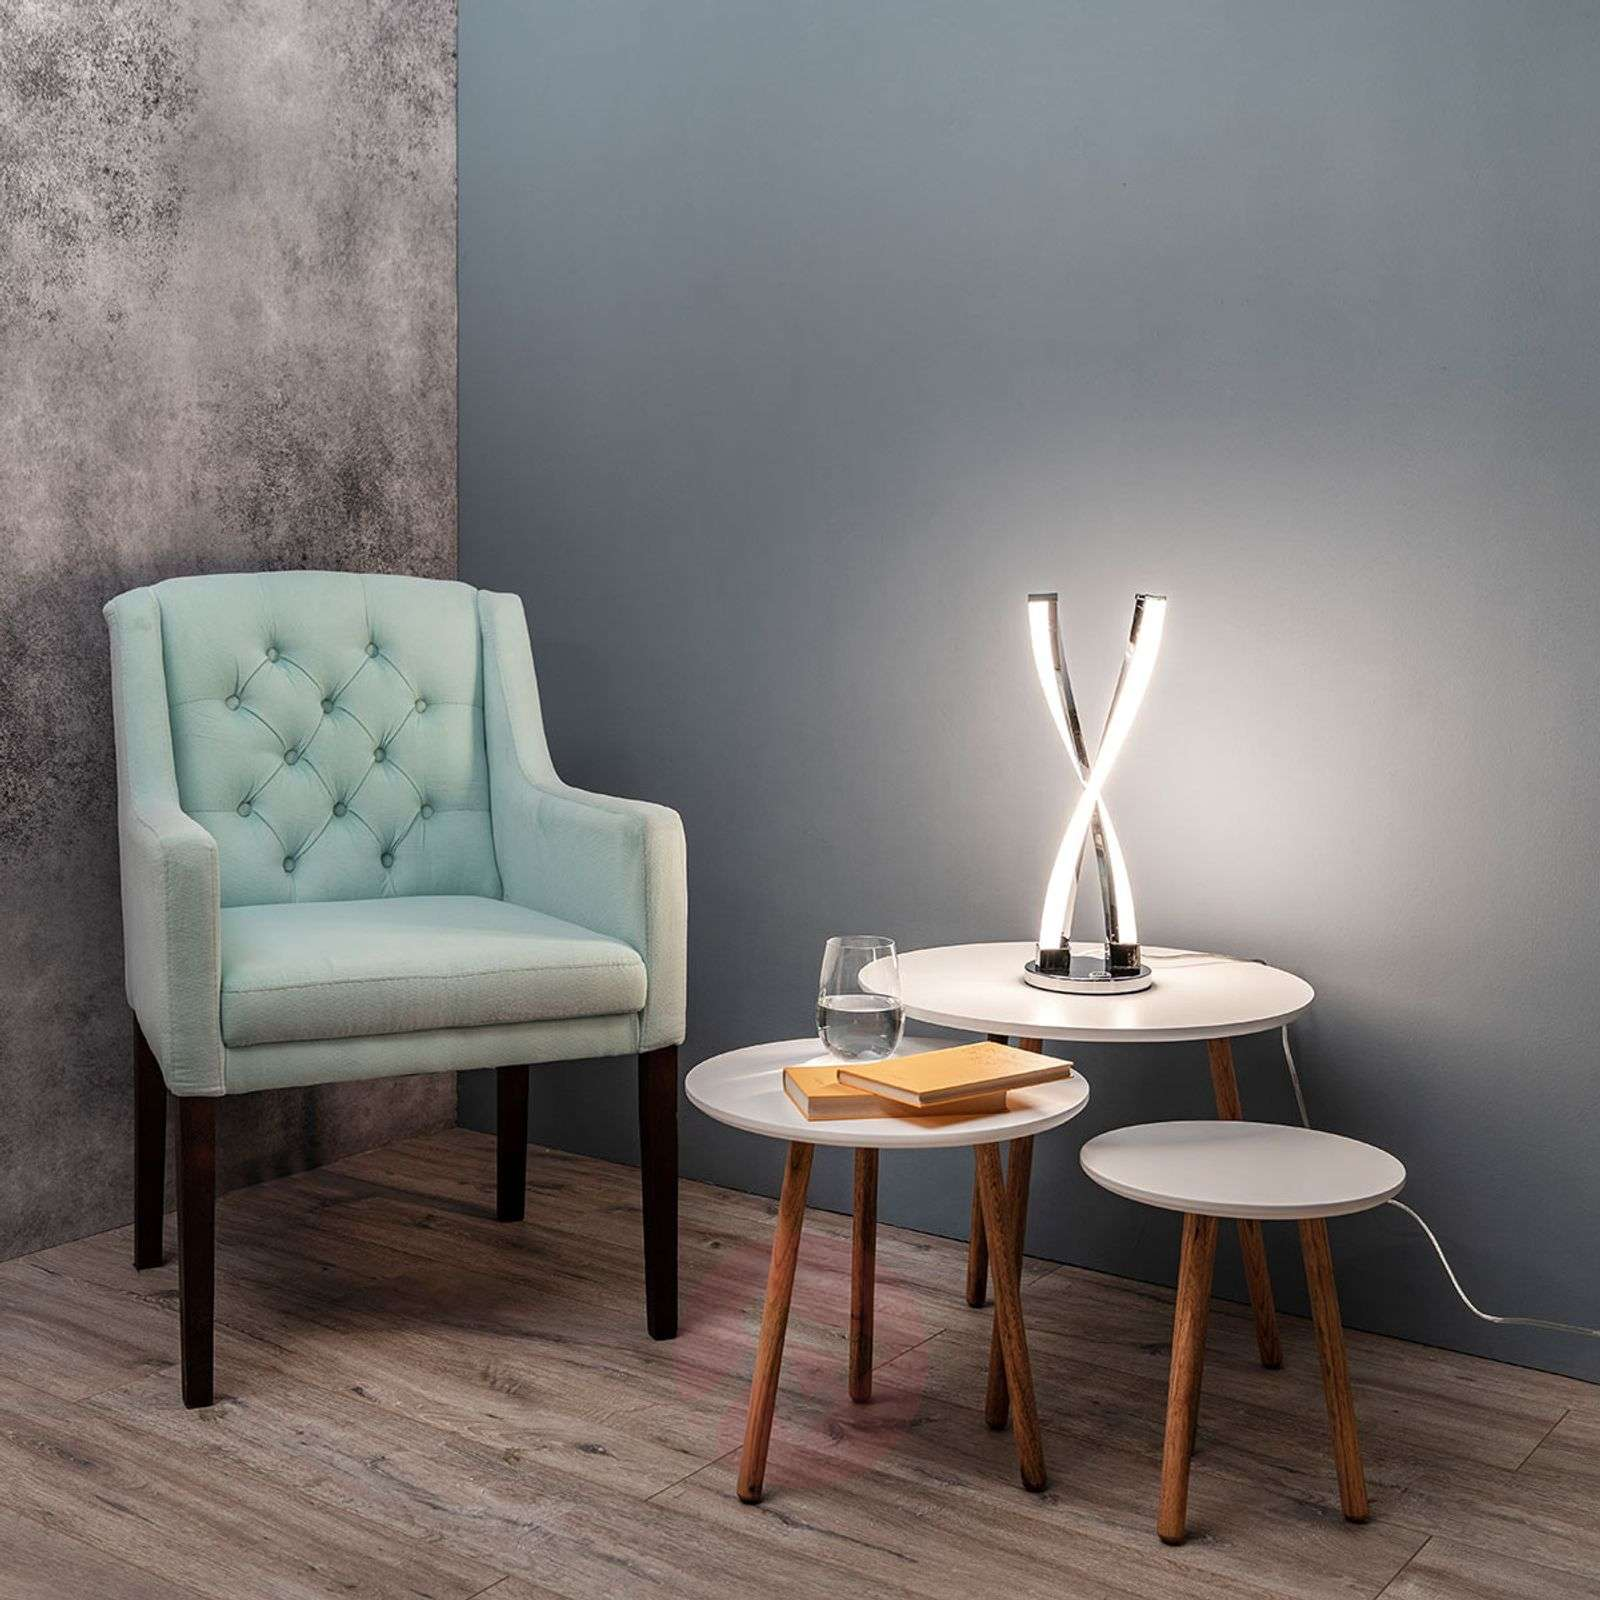 Idana glossy chrome LED table lamp-9652036-01